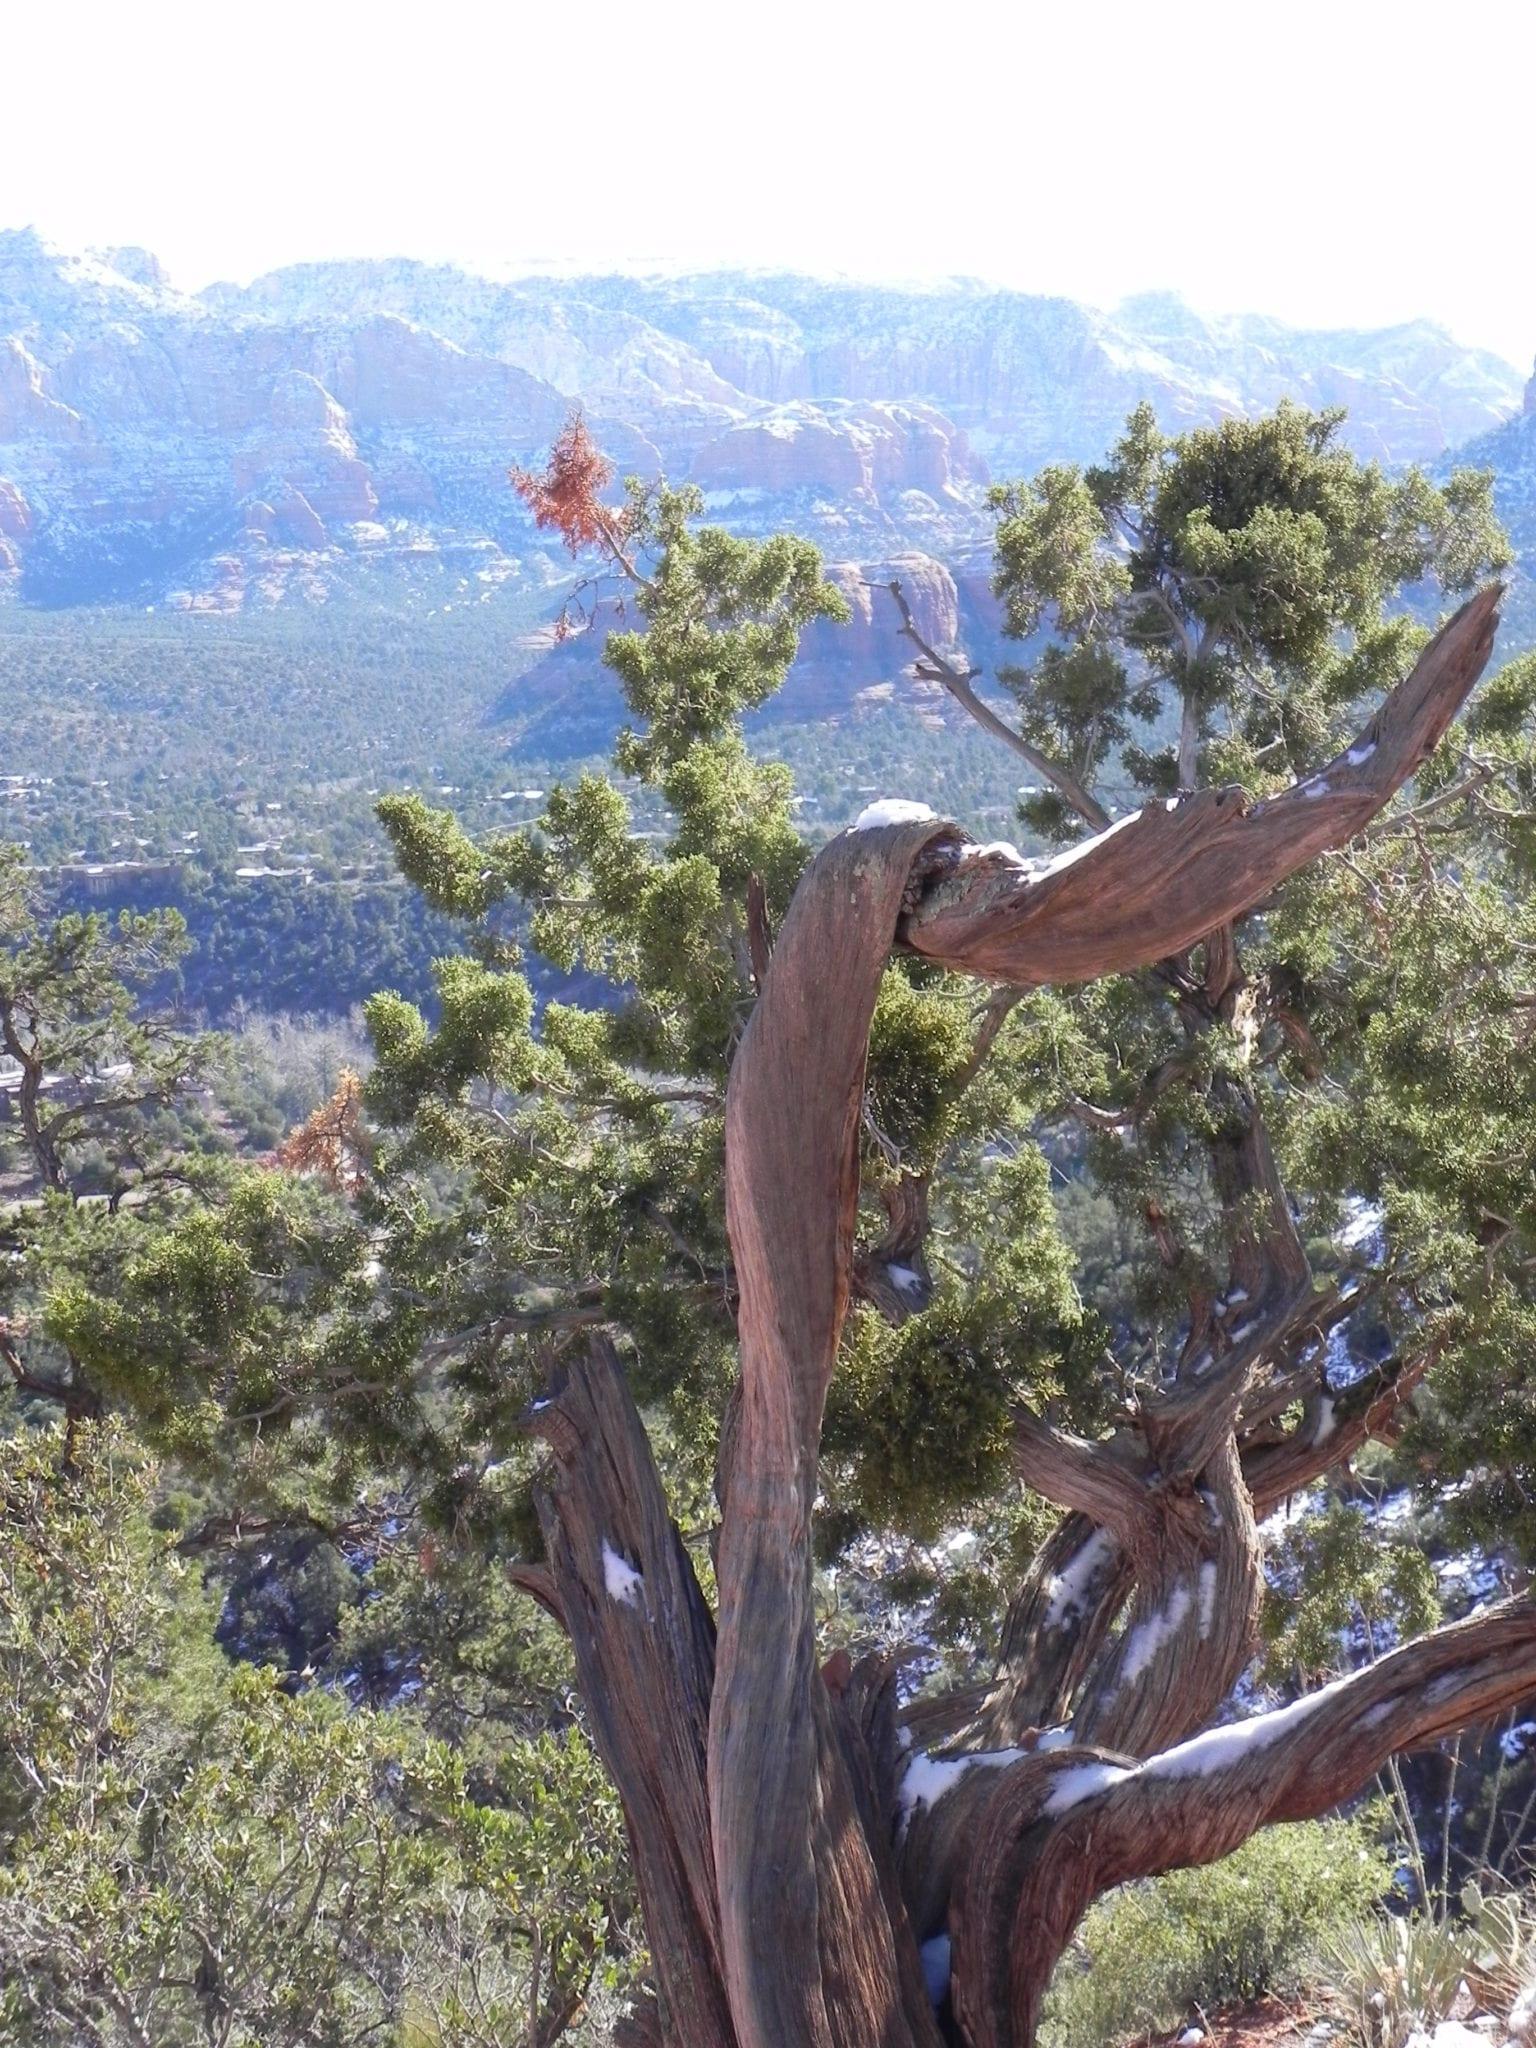 Sedona Vortex Twisted Tree at Airport Mesa Vortex